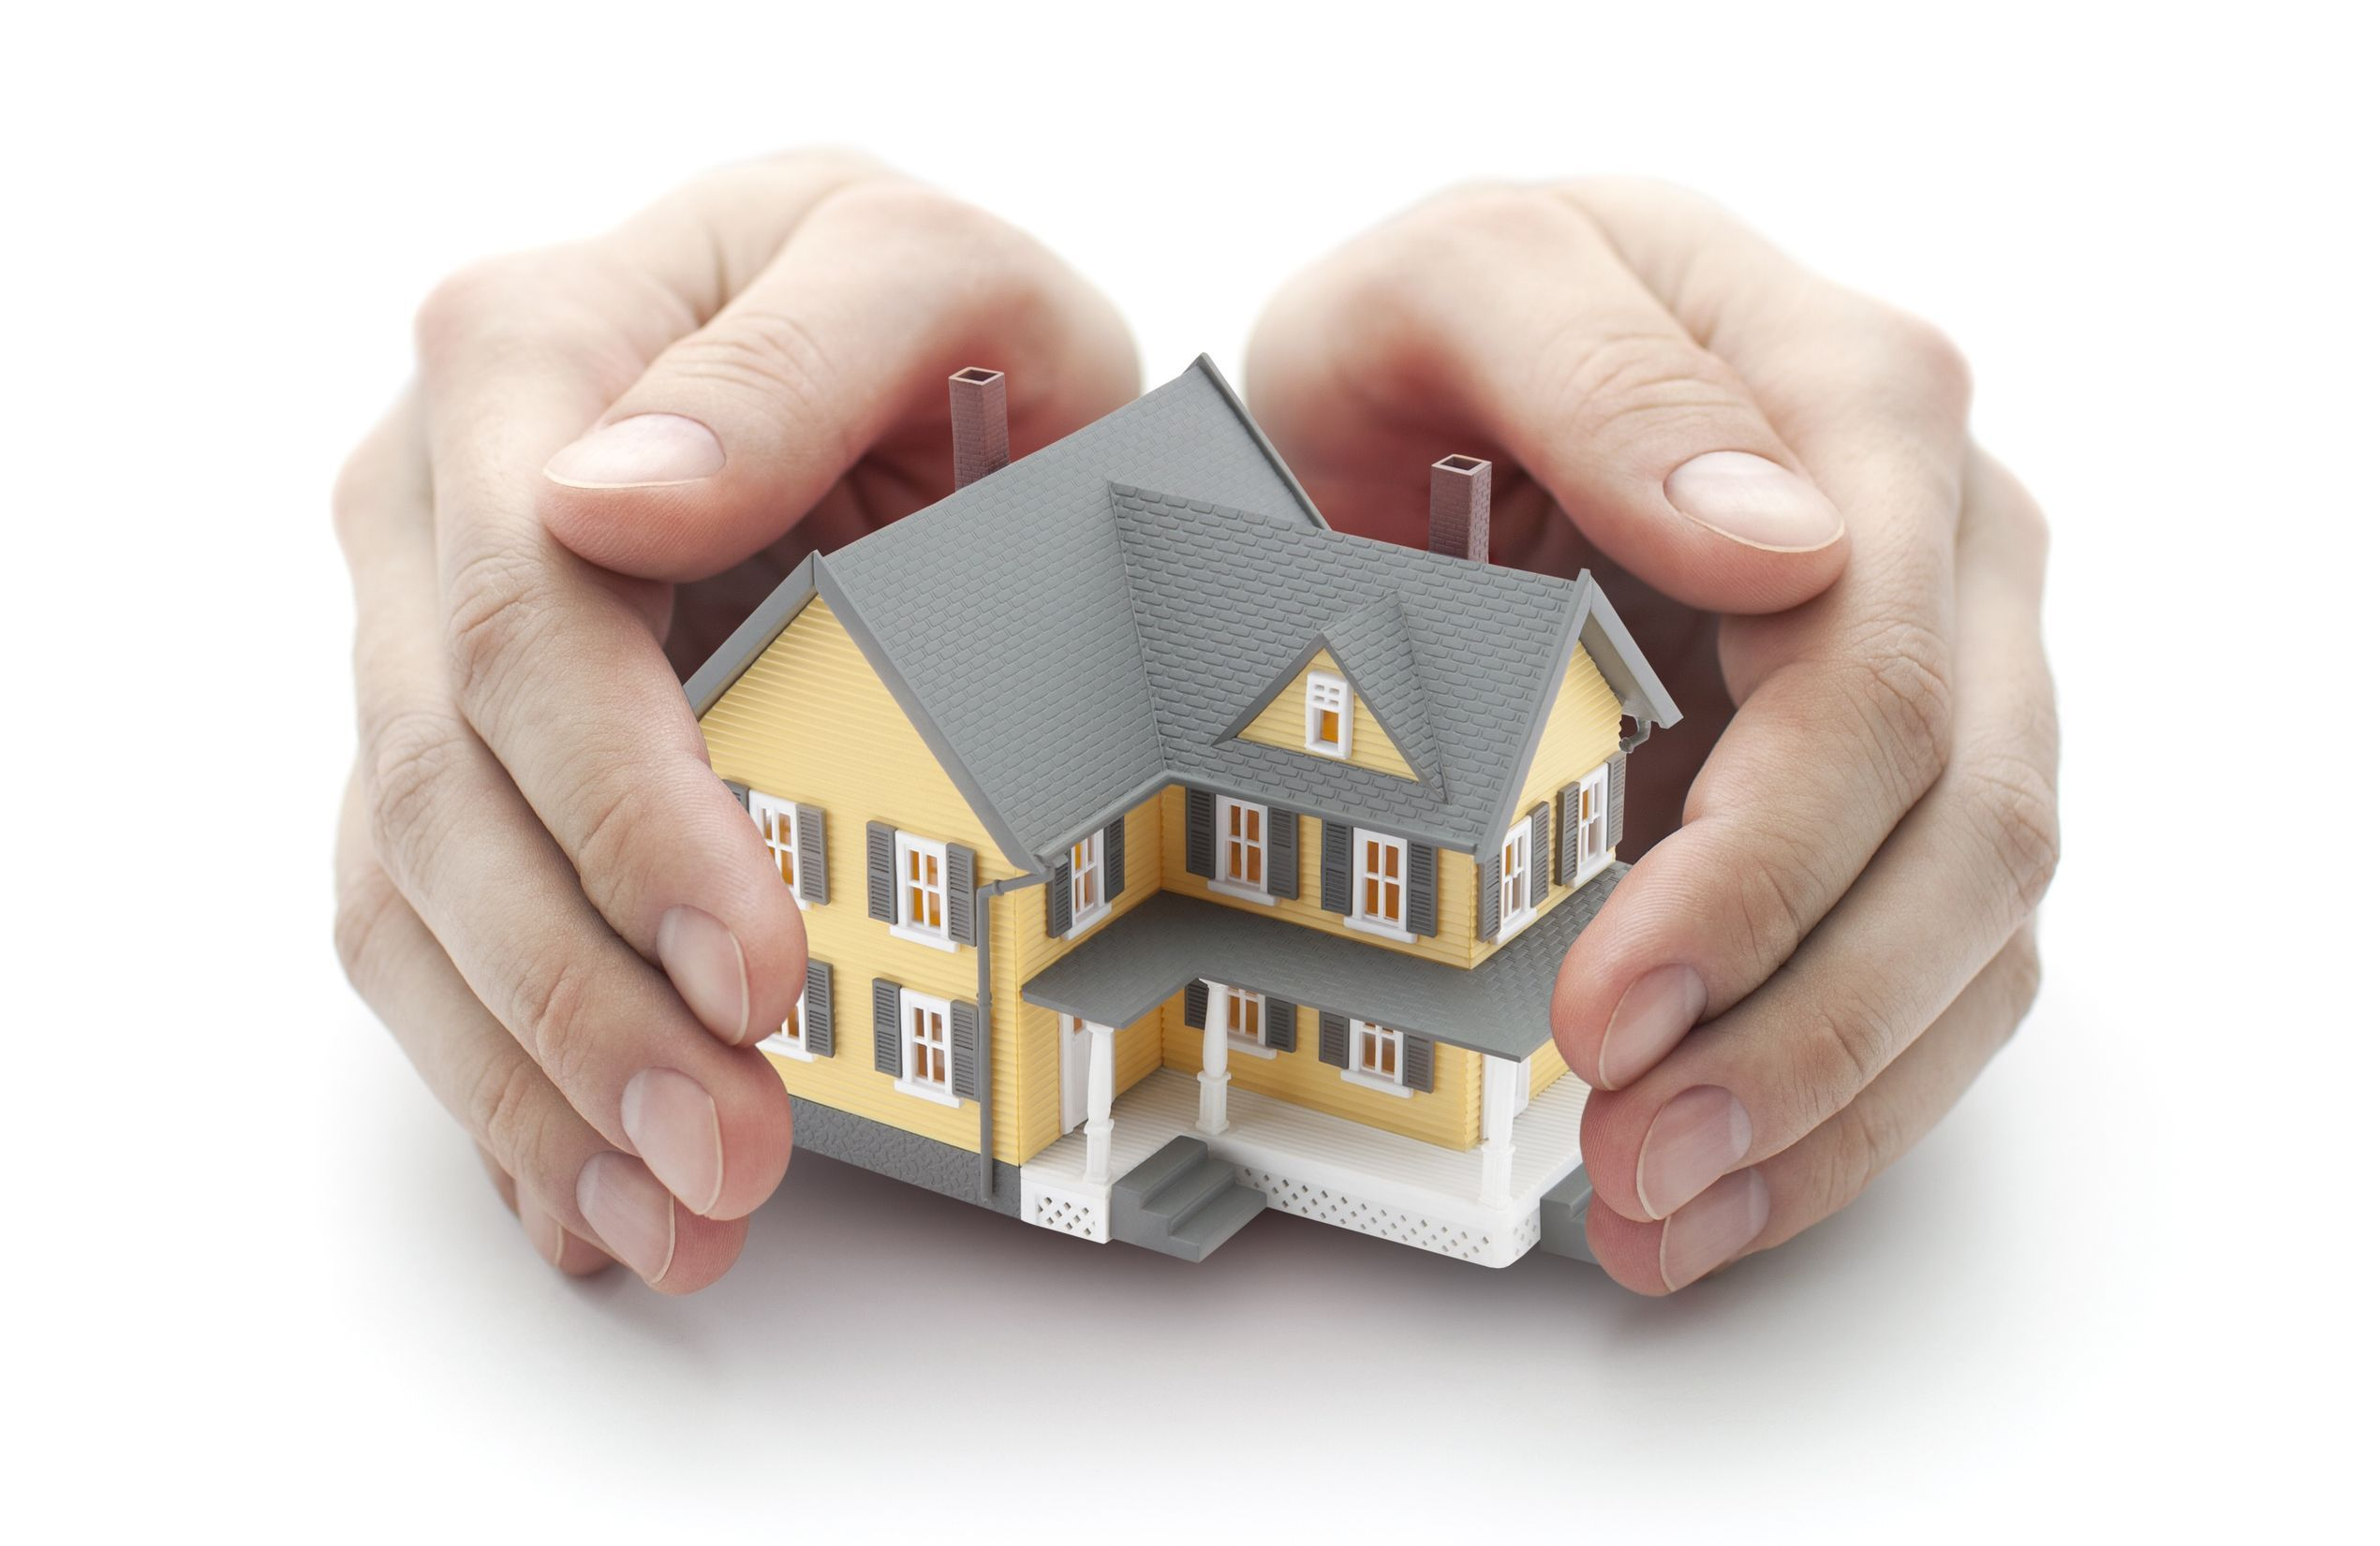 Dubai Marina مرسى دبي Homeowners Insurance Income Protection